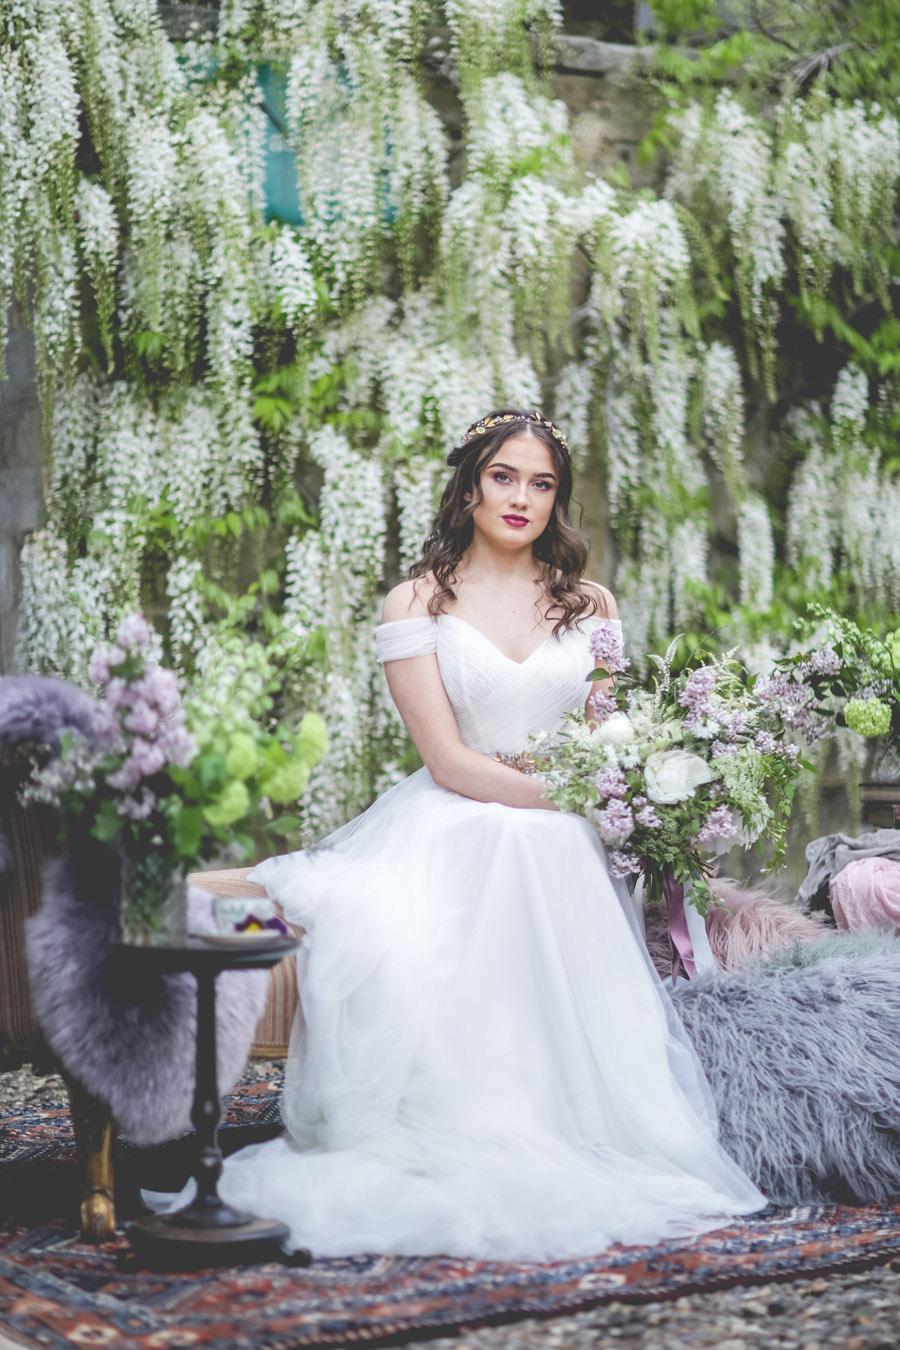 Eshott Hall wedding inspiration, credit Sean Elliott Photography (3)